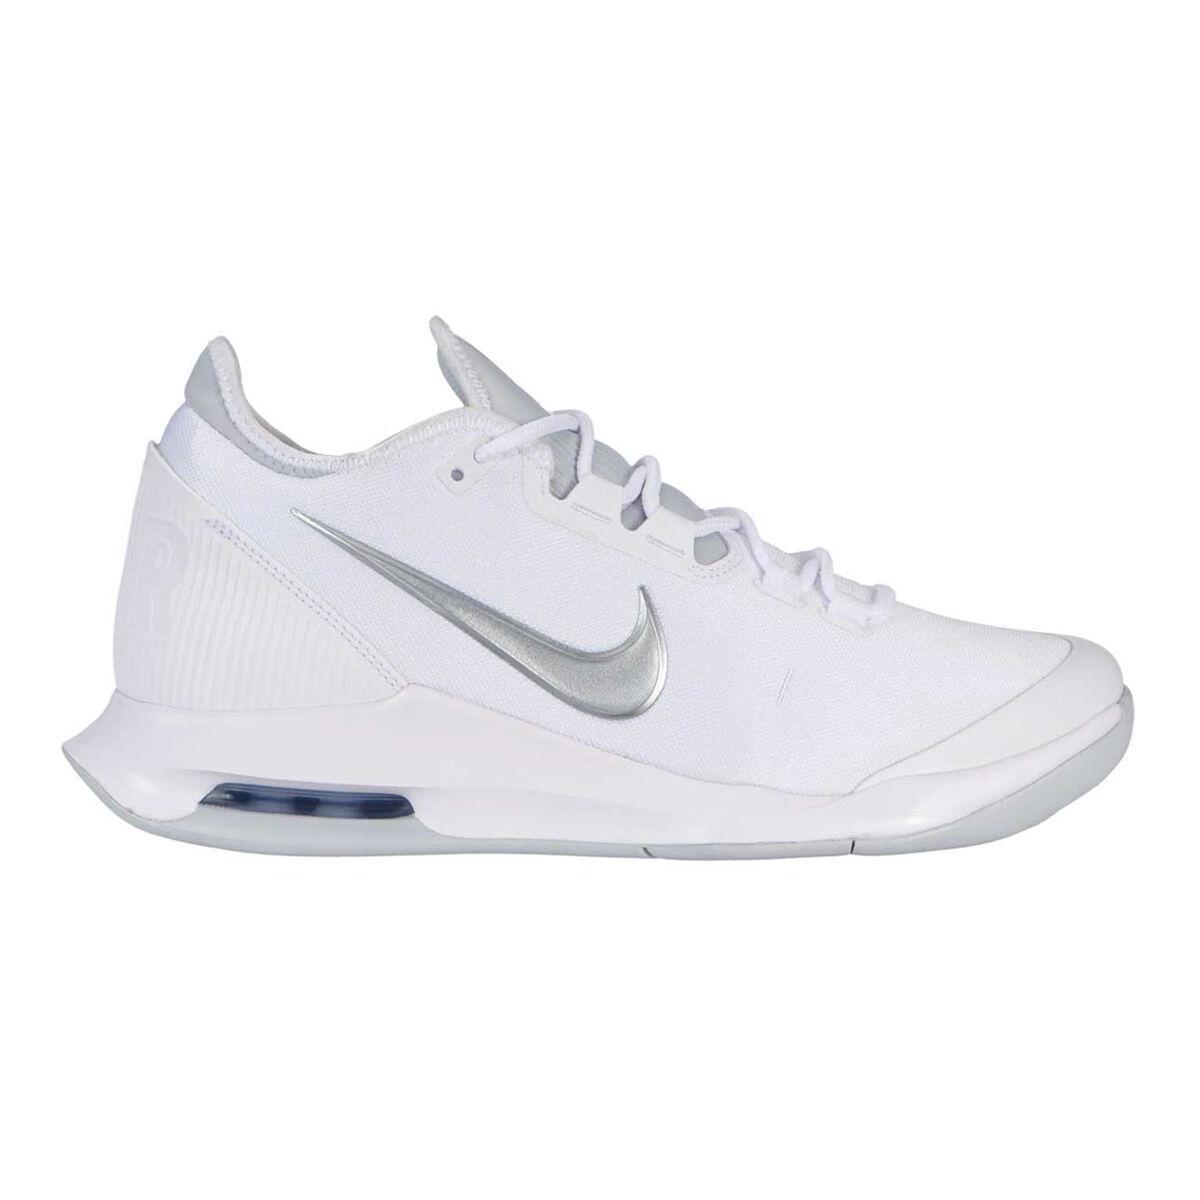 silver nike tennis shoes